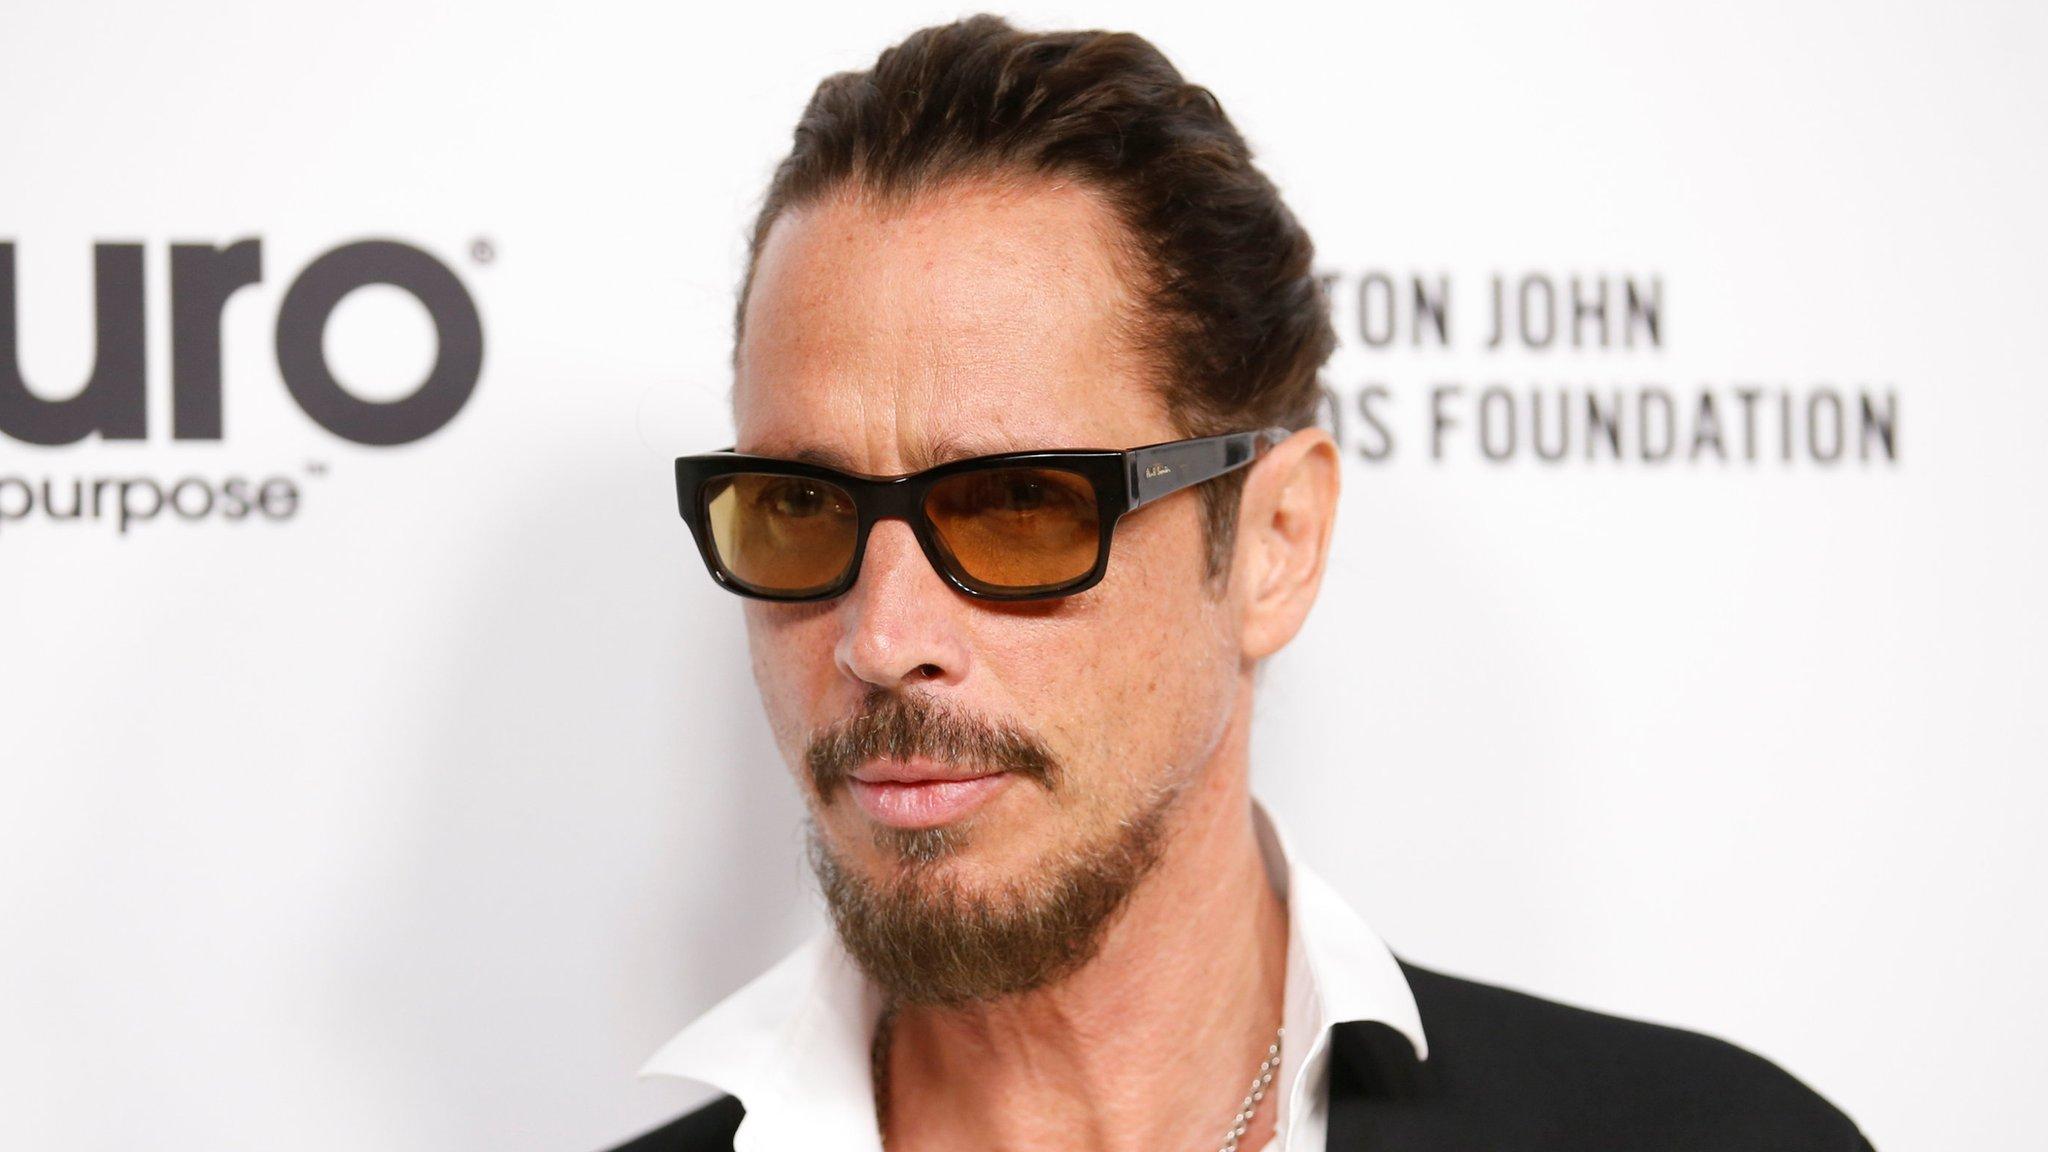 BBC News - Chris Cornell: Doctor sued over Soundgarden star's 2017 death